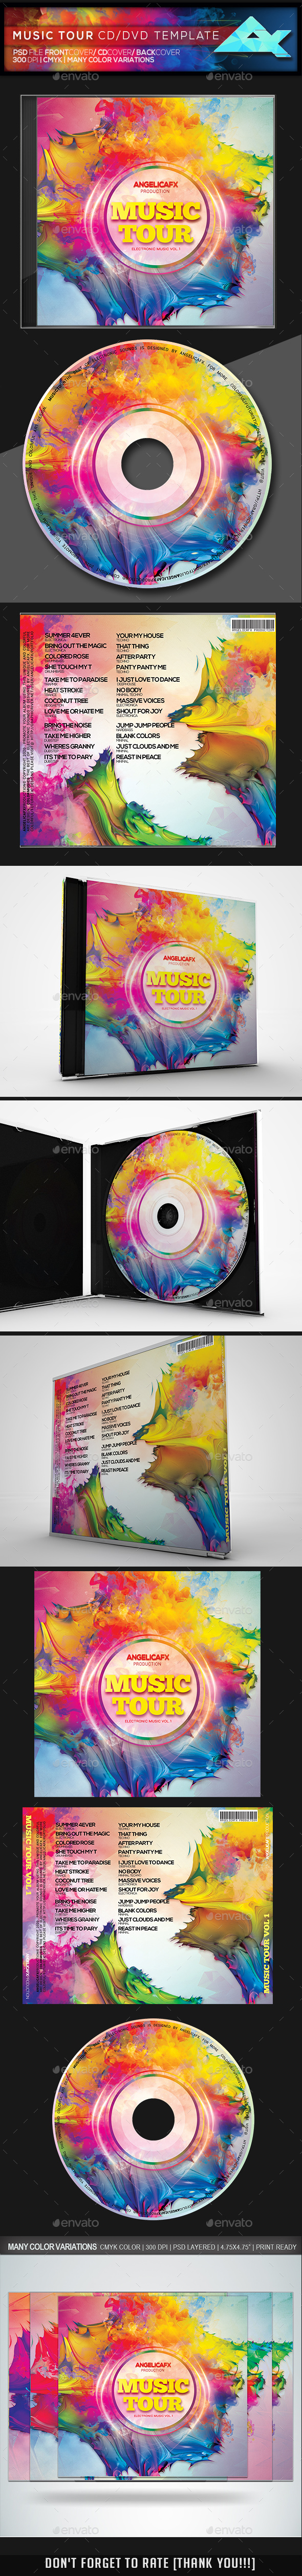 Music Tour CD/DVD Template - CD & DVD Artwork Print Templates